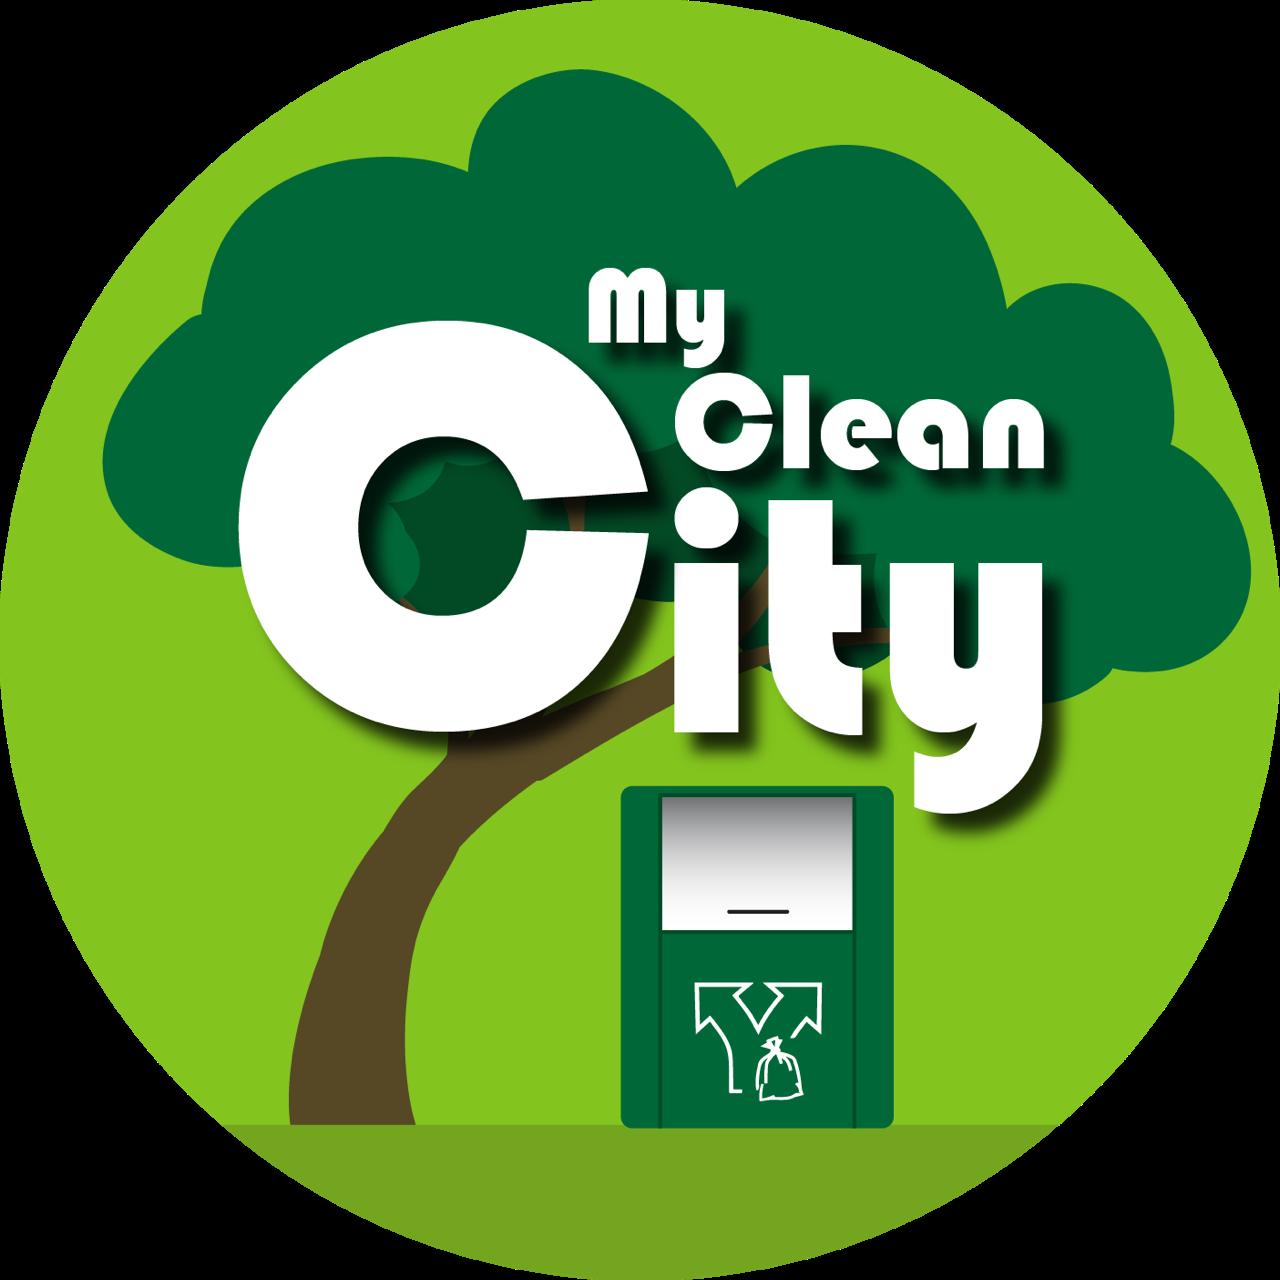 Garbage clipart clean neighborhood. Mycleancity app accenture innovation